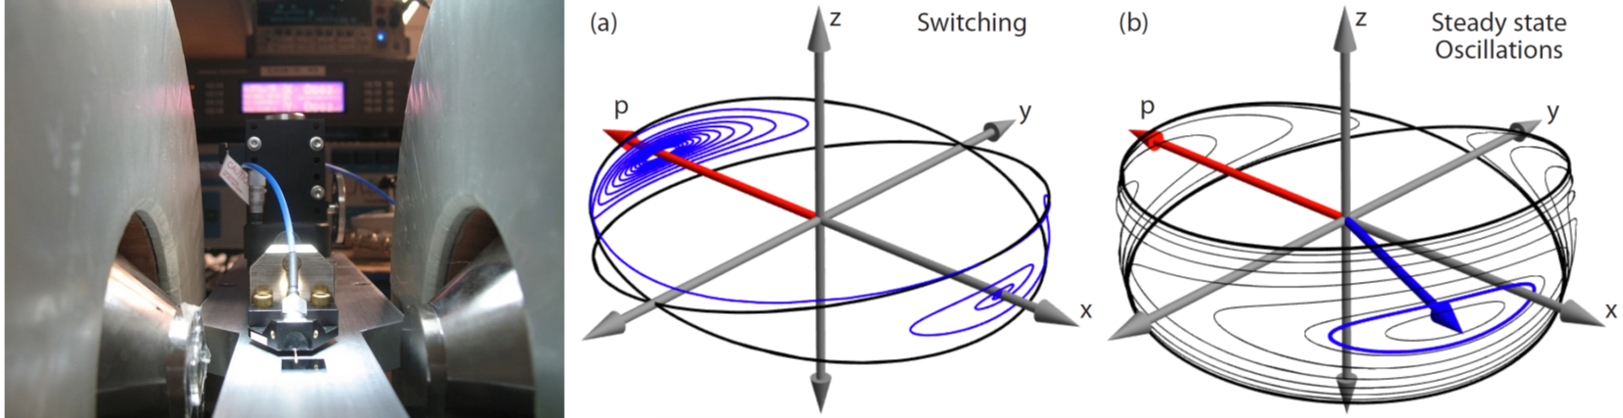 Ultrafast magneto-dynamics